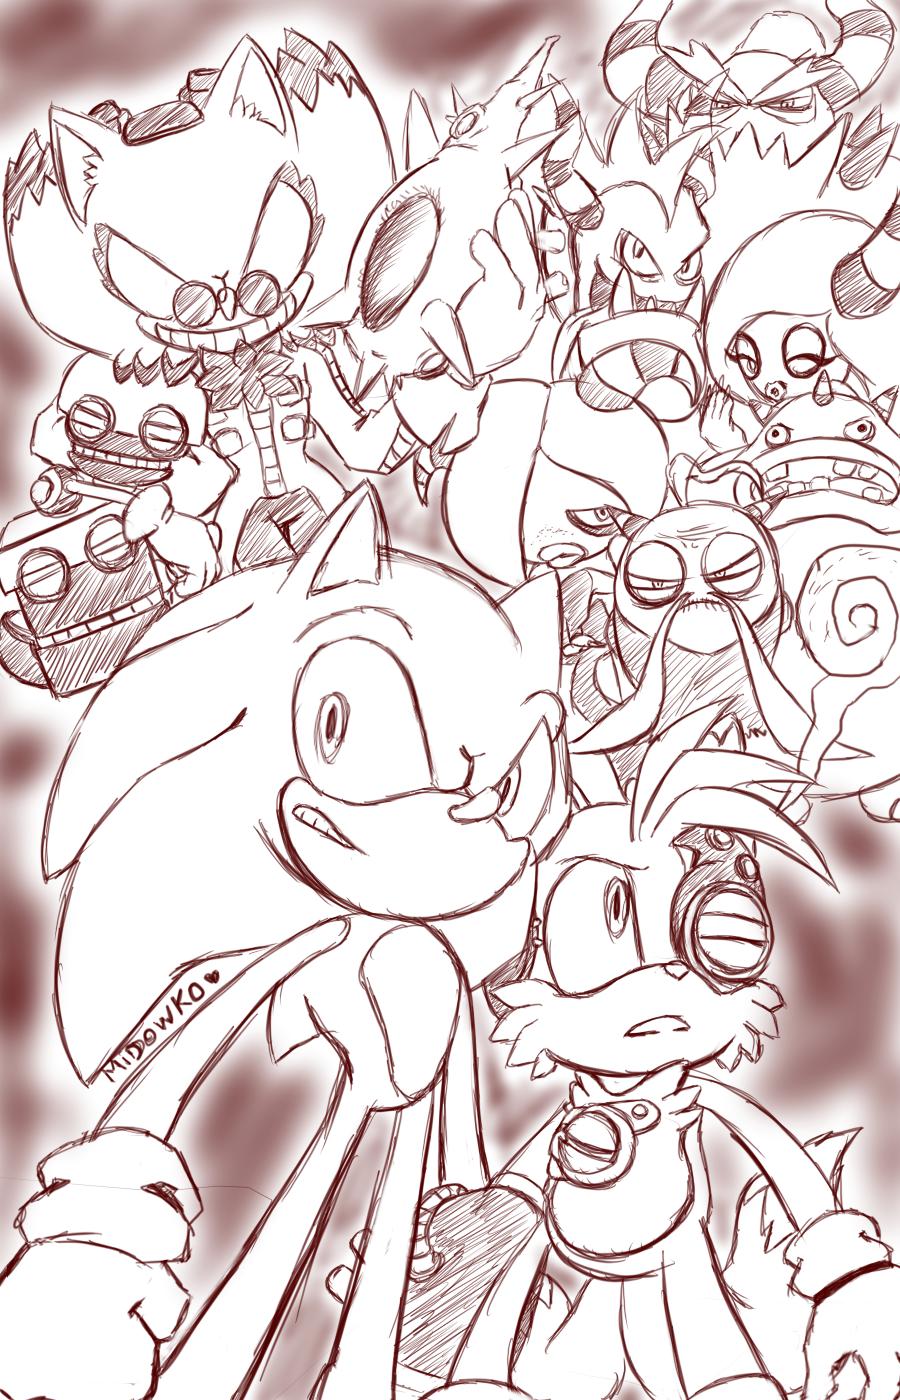 Sonic lost world by Midowko on DeviantArt